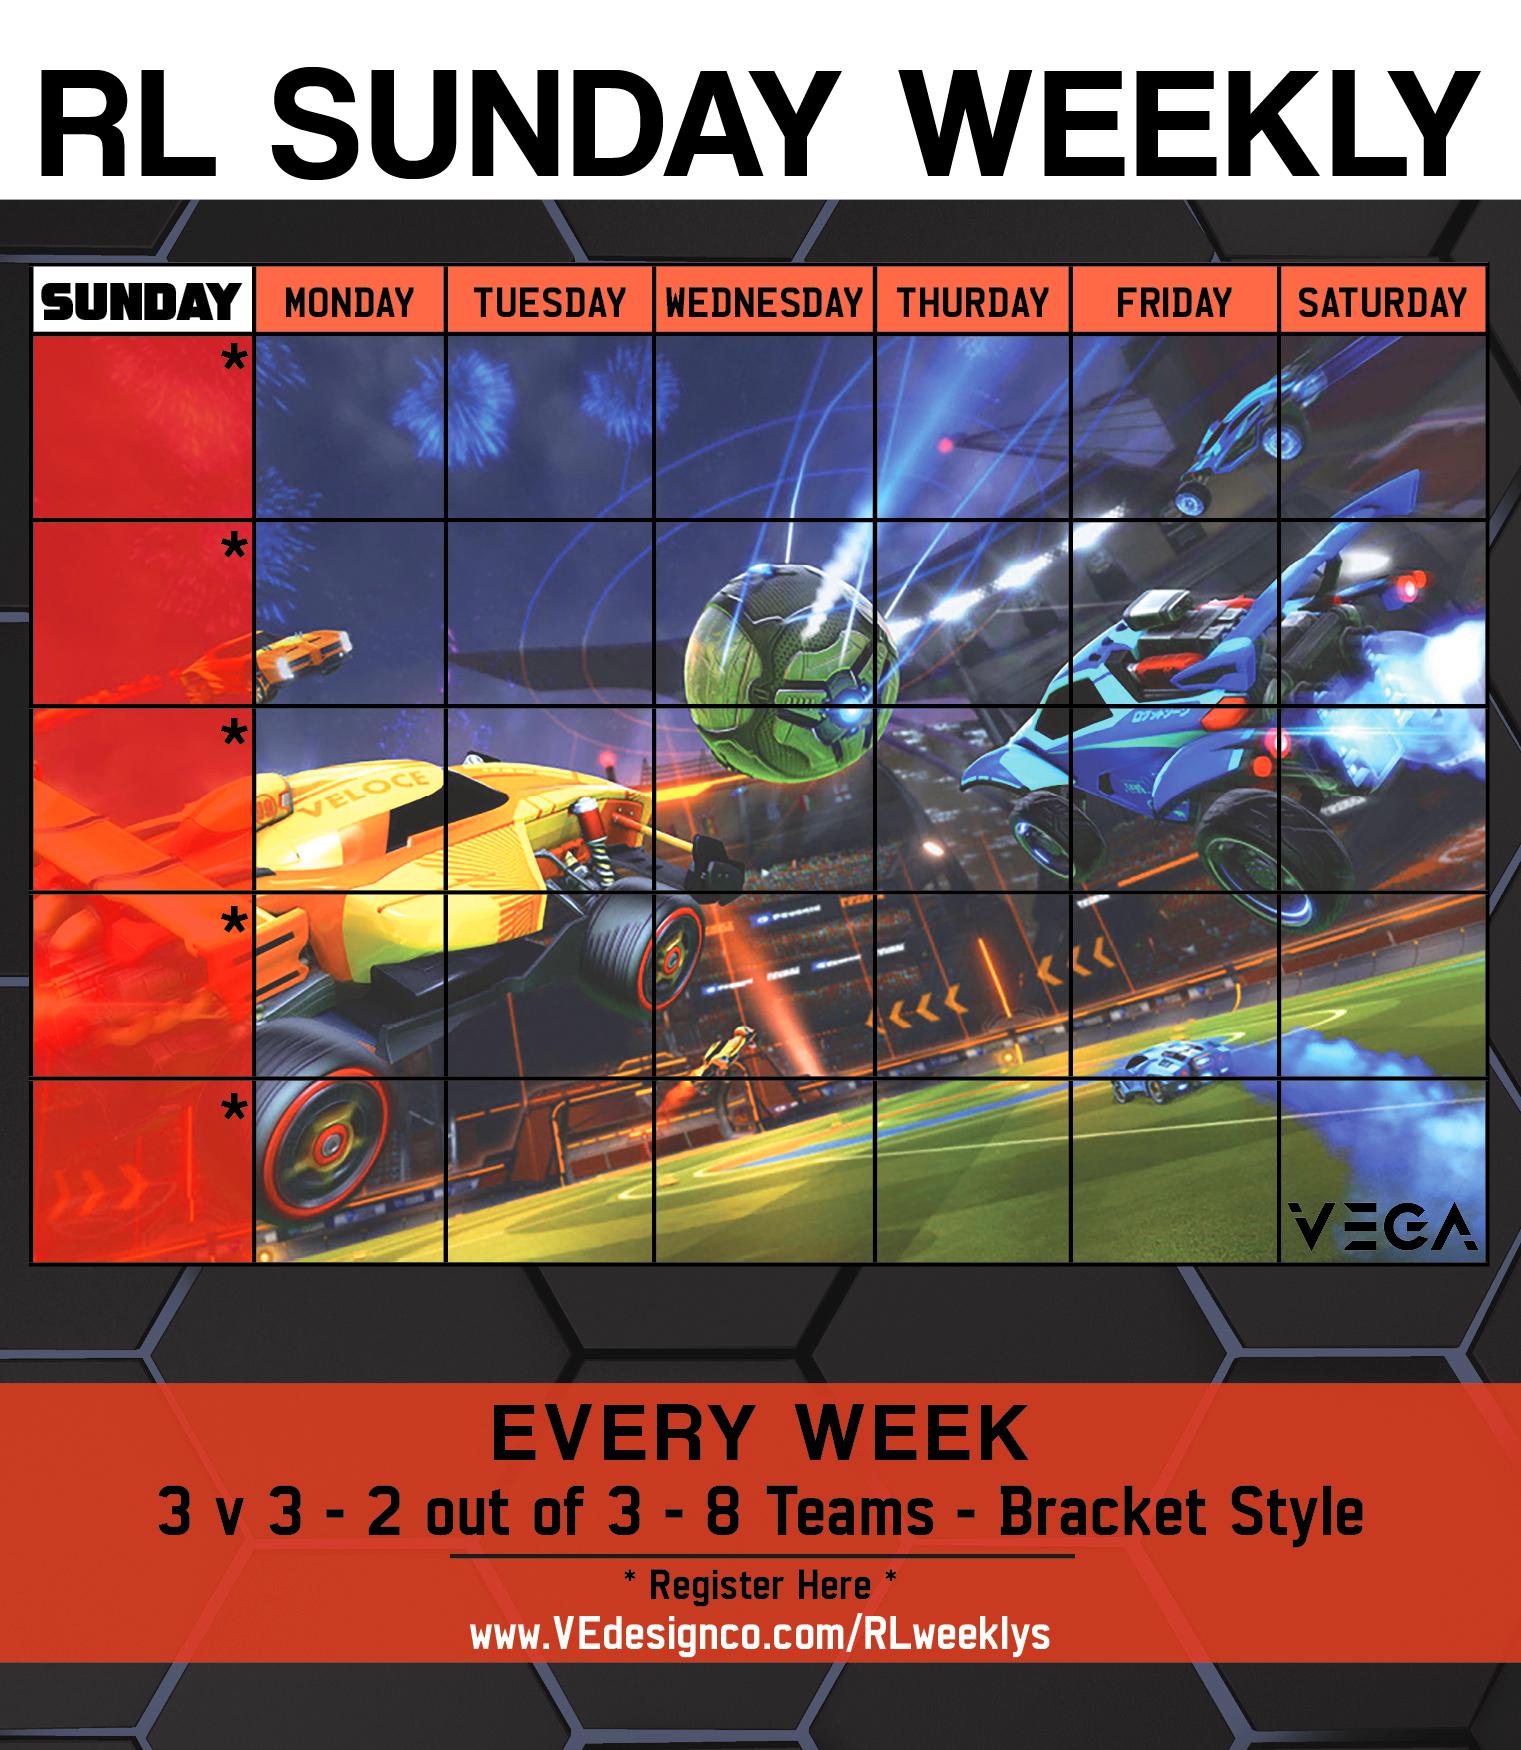 RL Sunday Weekly.jpg